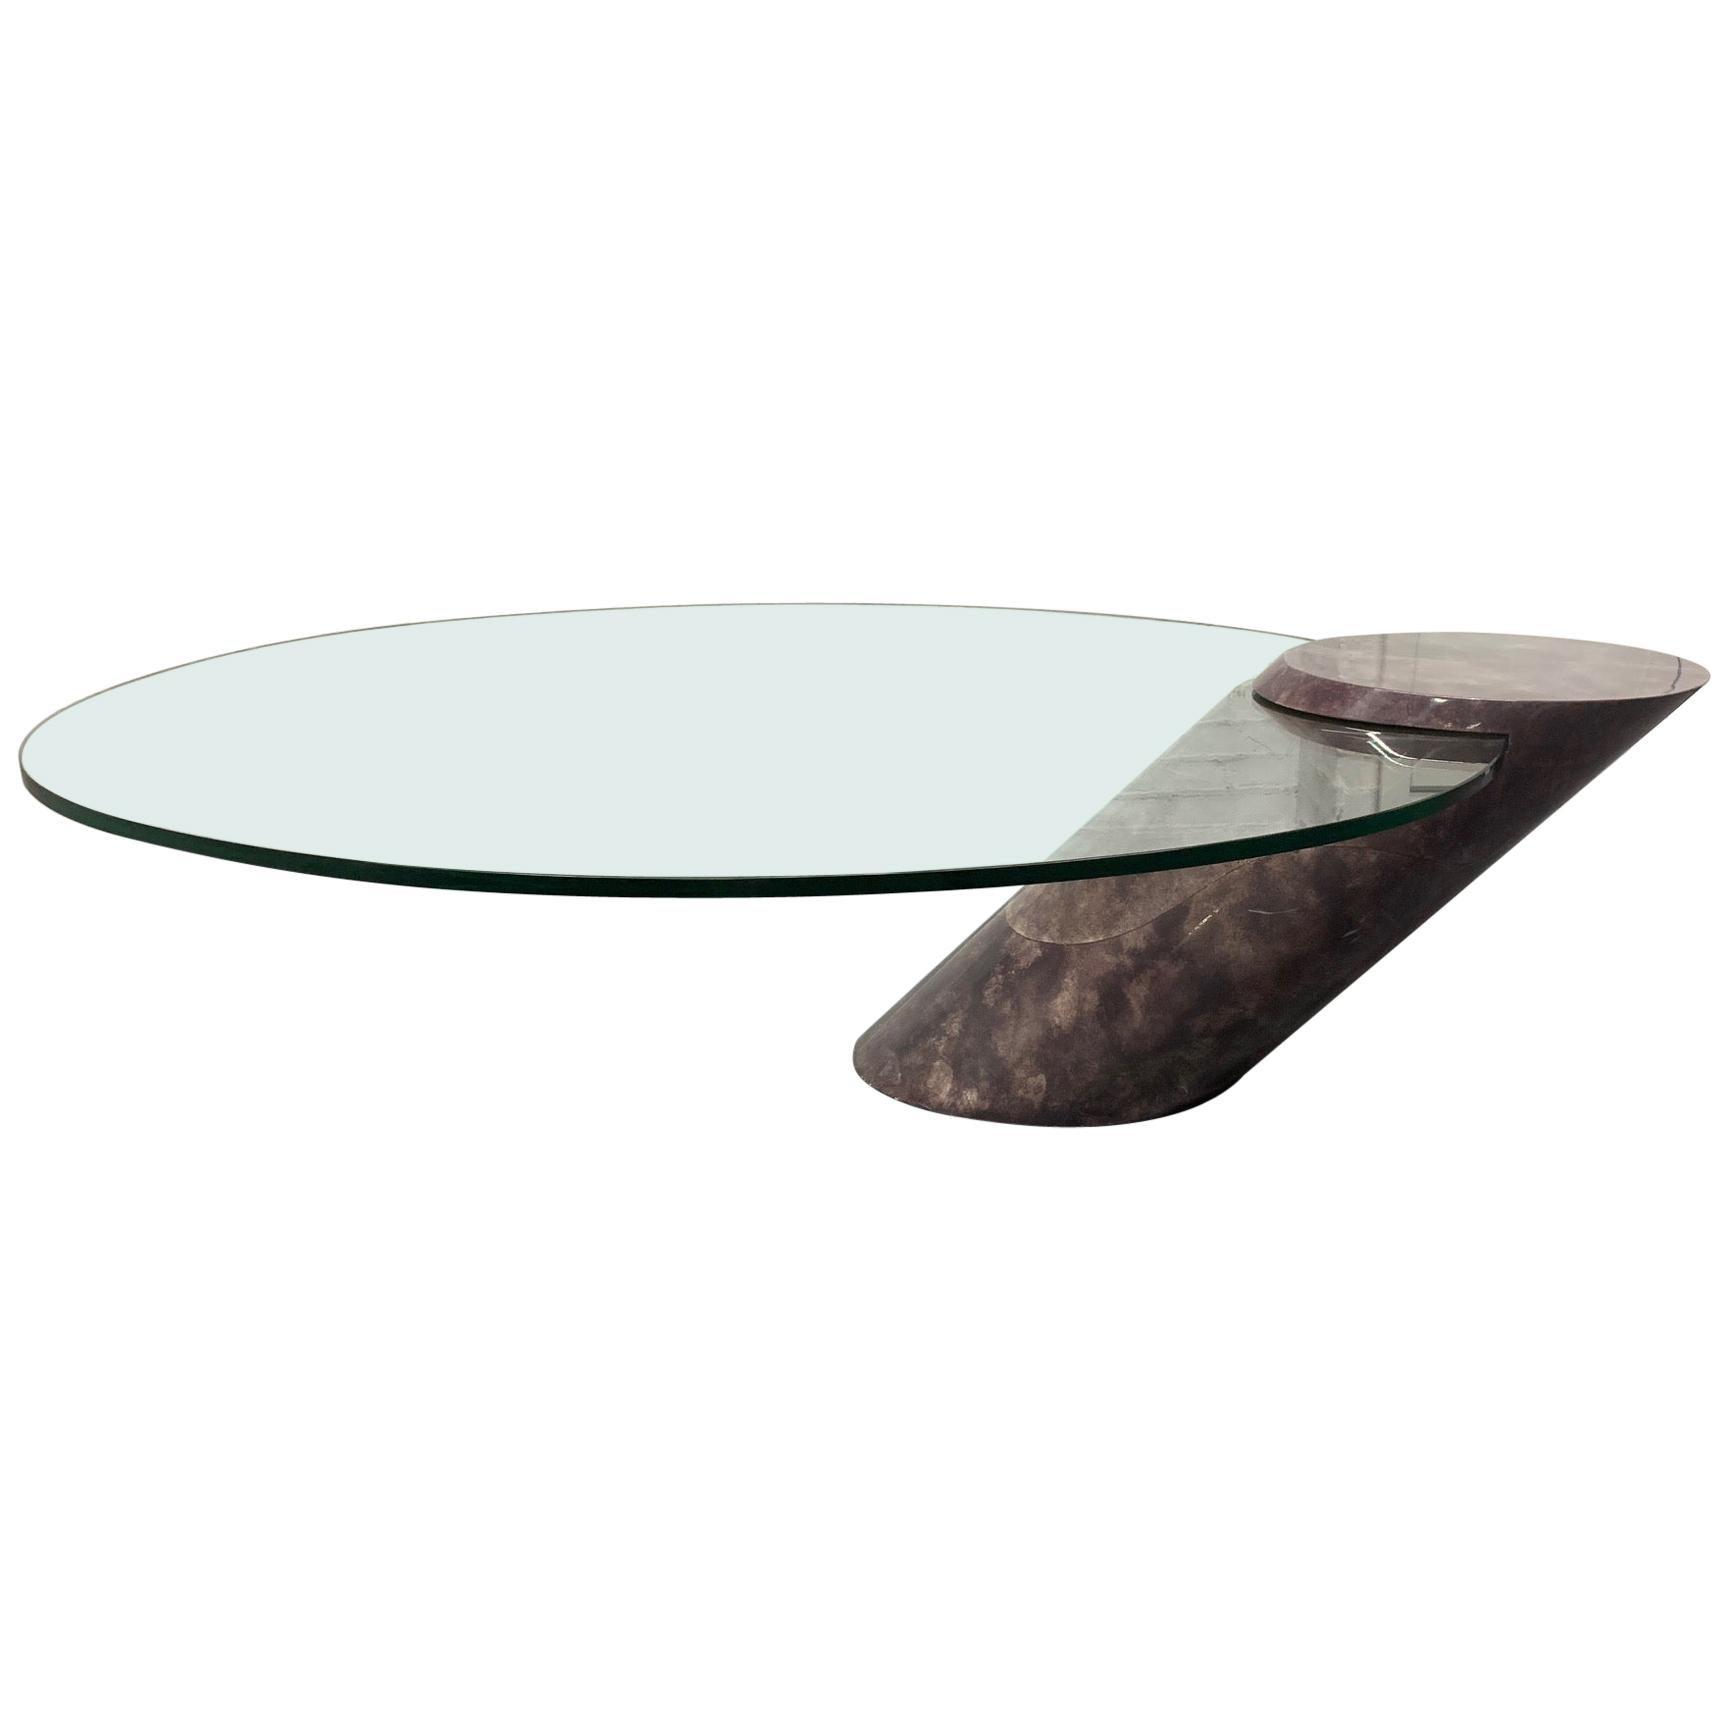 Karl Springer Style Goatskin Cantilevered Coffee Table